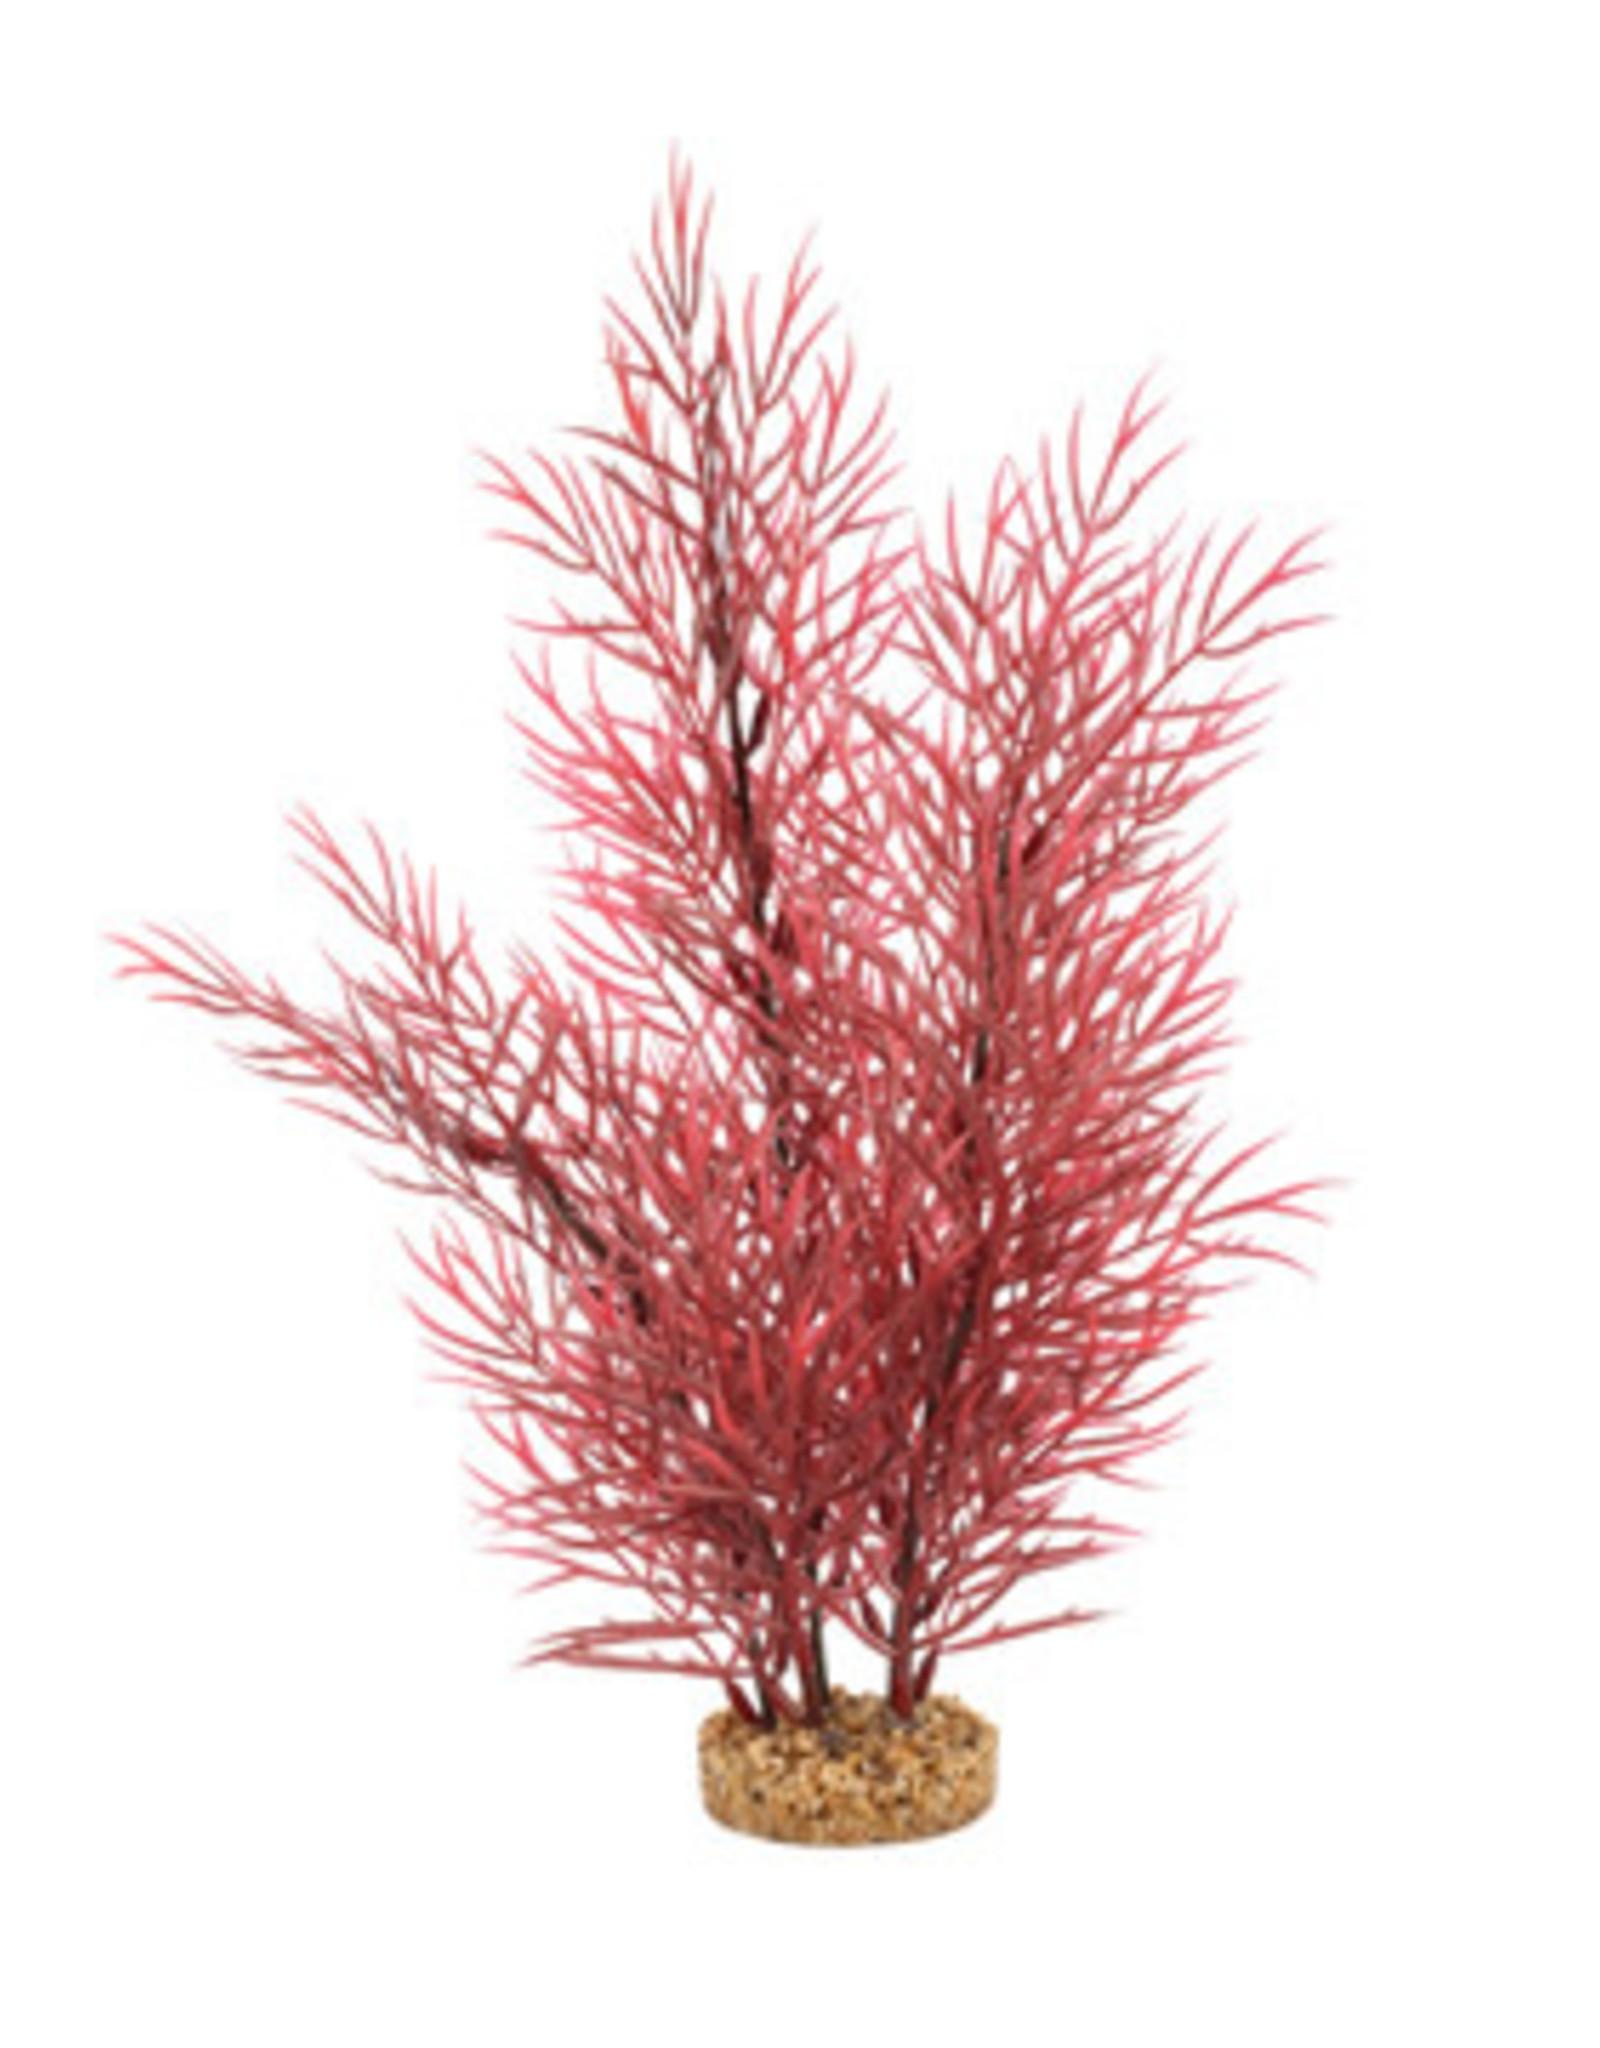 Fluval Fluval Aqualife Plant Scapes Scarlet Eichornea - 35.5 cm (14 in)